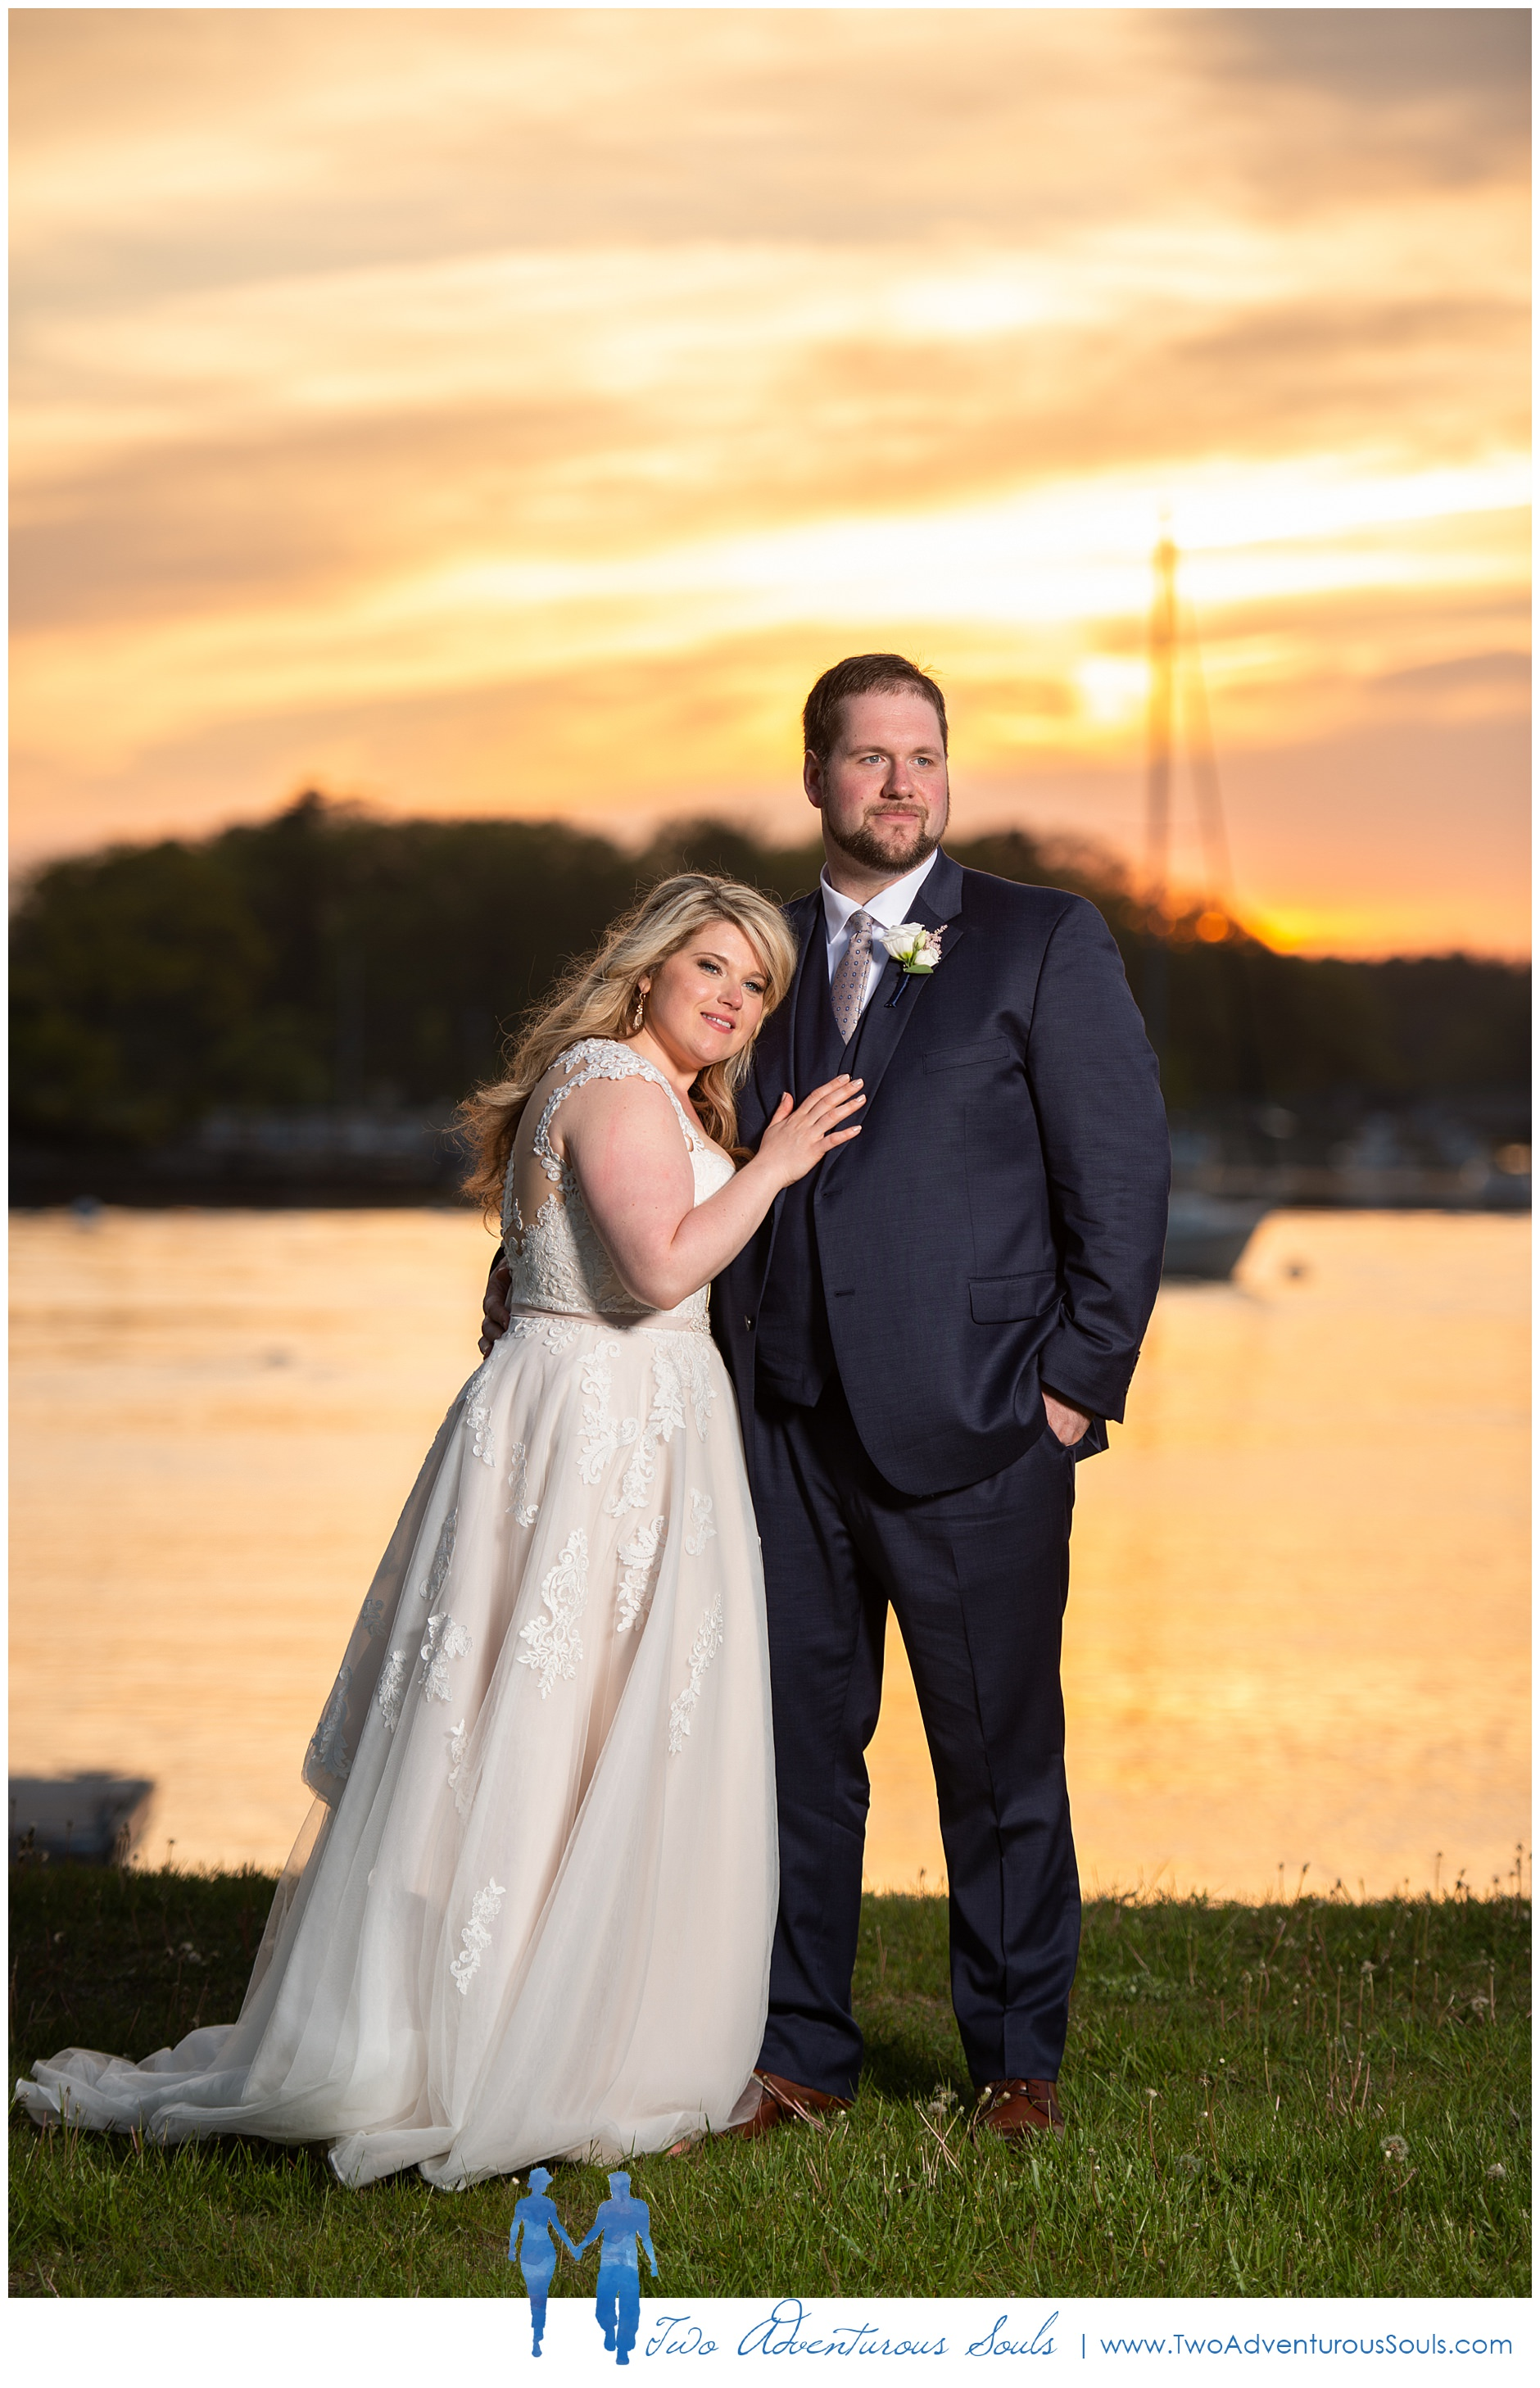 Maine+Wedding+Photographers,+Stage+Neck+Inn+Wedding+Photographers,+Two+Adventurous+Souls,+51819_0045.jpg